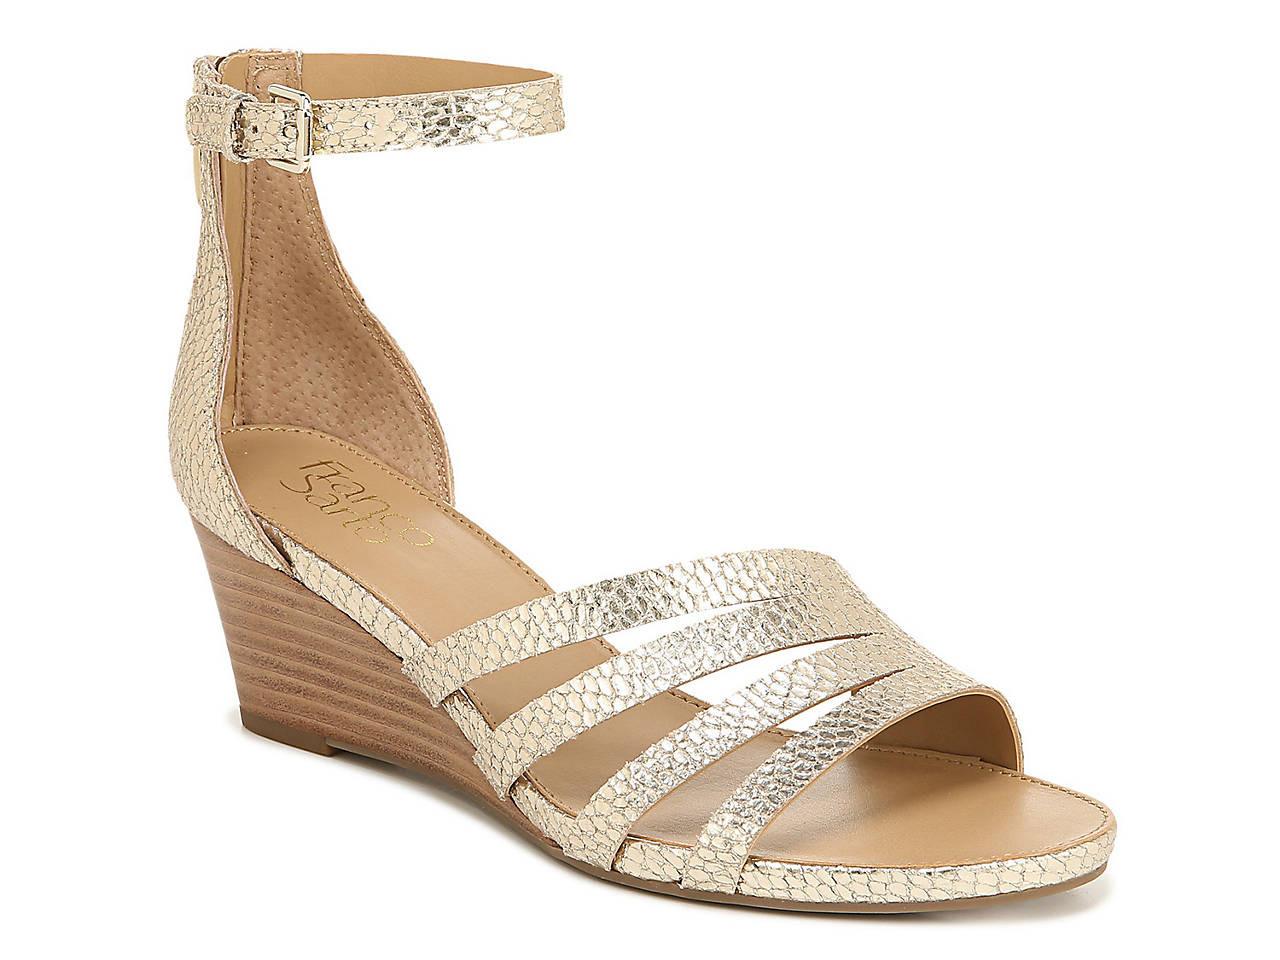 9e29dc352715 Franco Sarto Dutch Wedge Sandal Women's Shoes | DSW